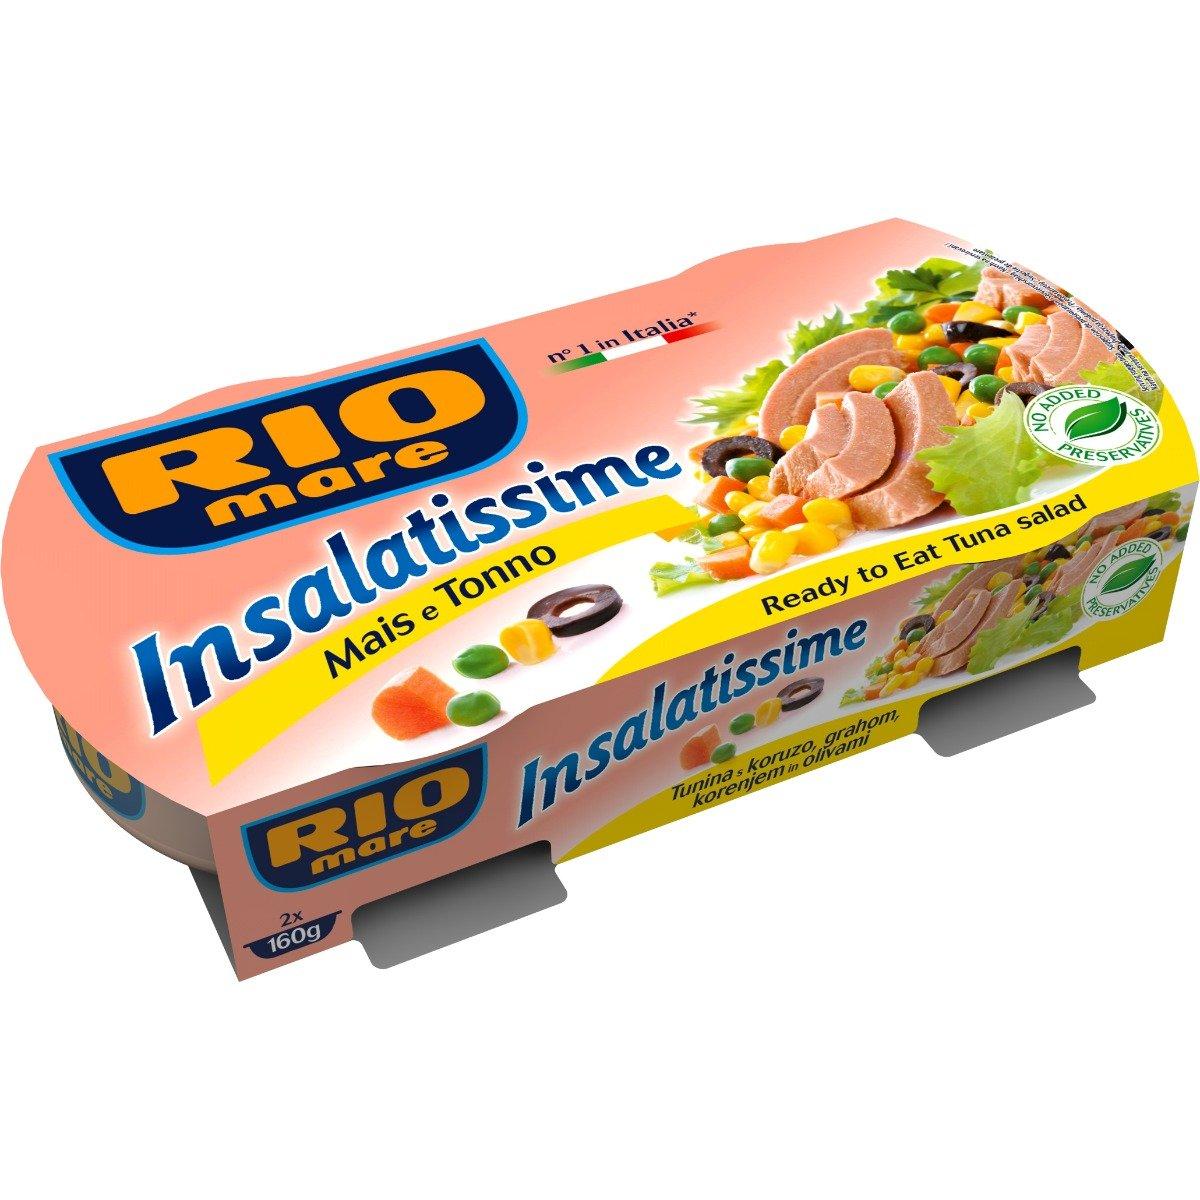 Salata de ton cu porumb Rio Mare, 2 conserve x 160 g imagine 2021